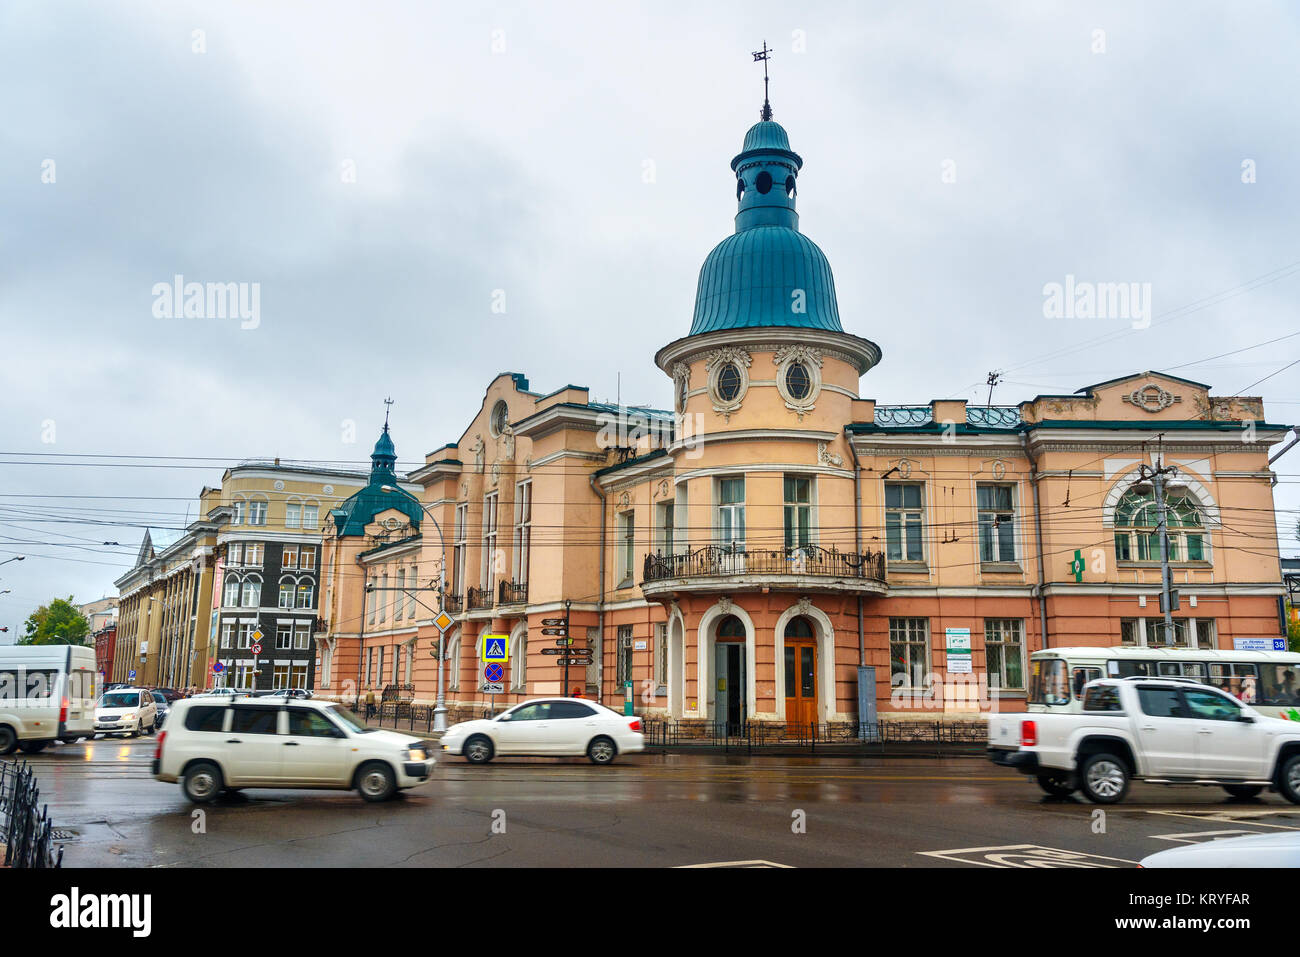 Irkutsk, Russia - August 14, 2017: Russian - Asian Bank , Irkutsk Branc. Presently, it is a clinic #2. The building - Stock Image